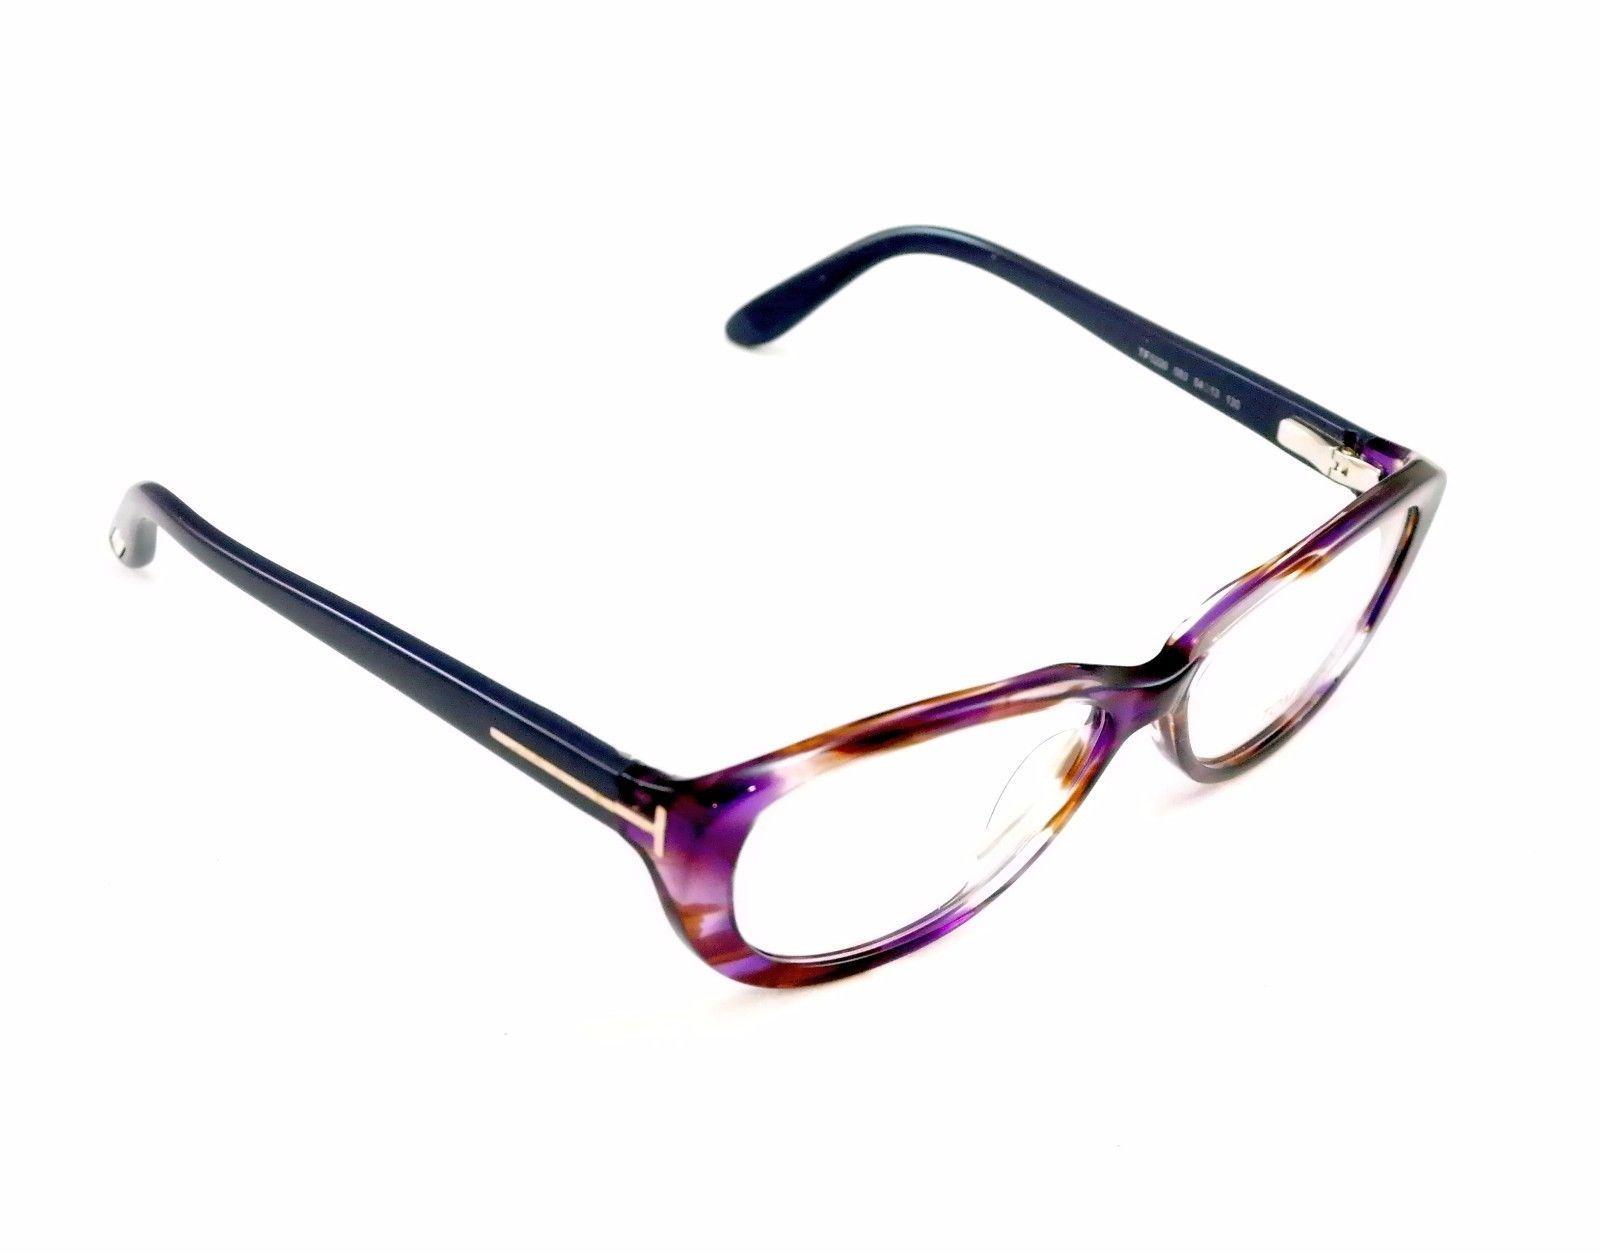 New Tom Ford Authentic Eyeglasses Frame TF5226 083 Purple Tortoise Acetate Italy